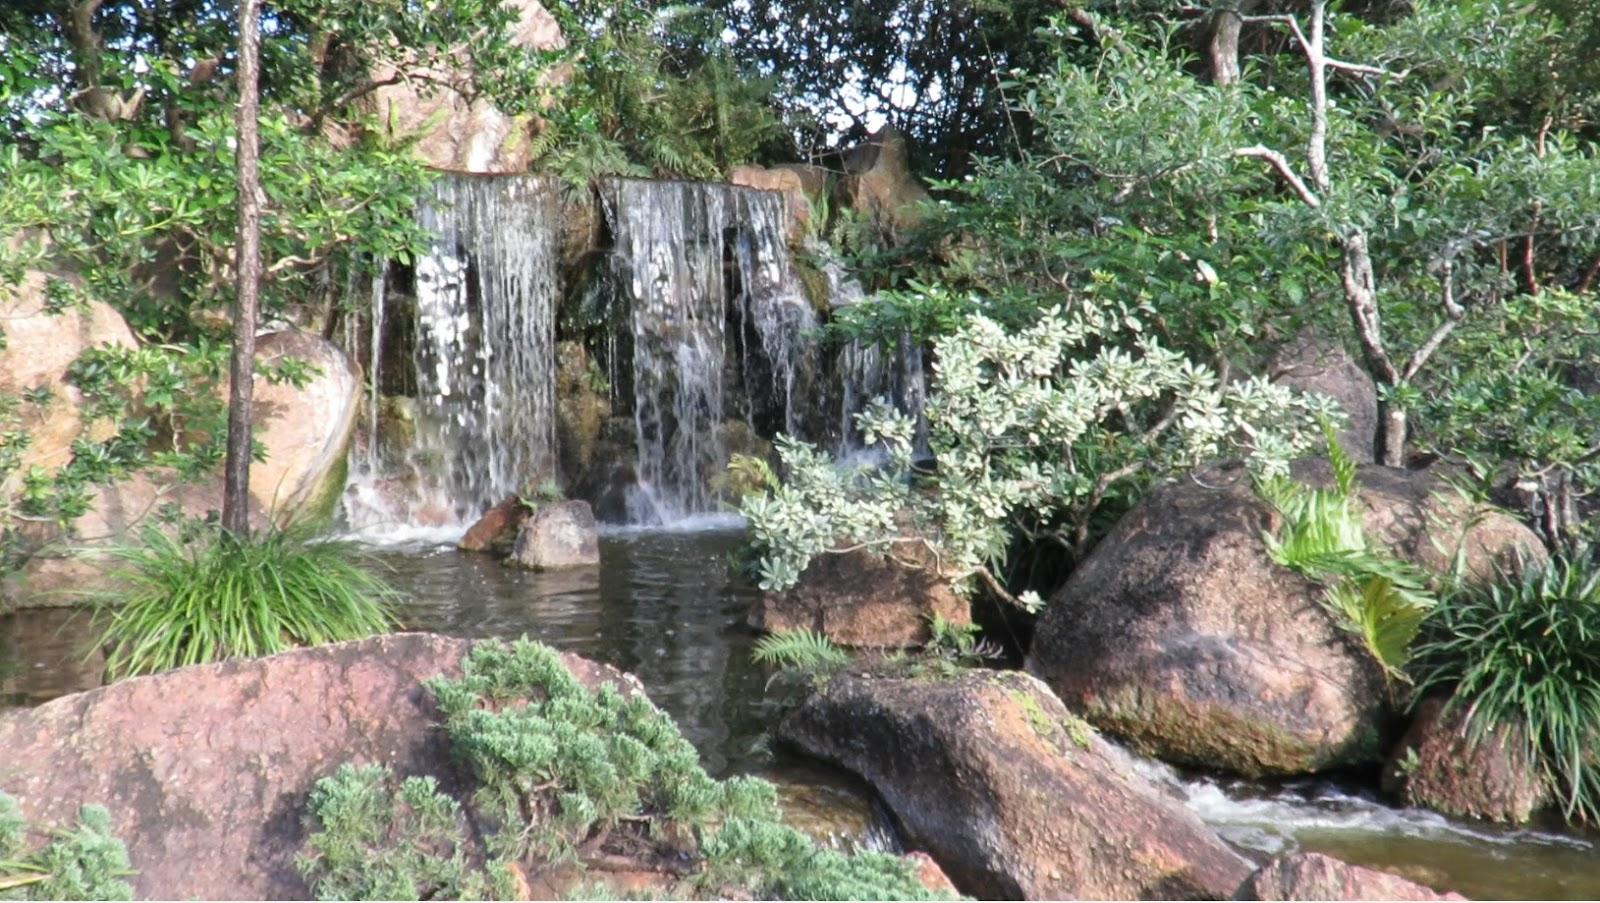 Backyard birding and nature march 2016 for Japanese meditation garden